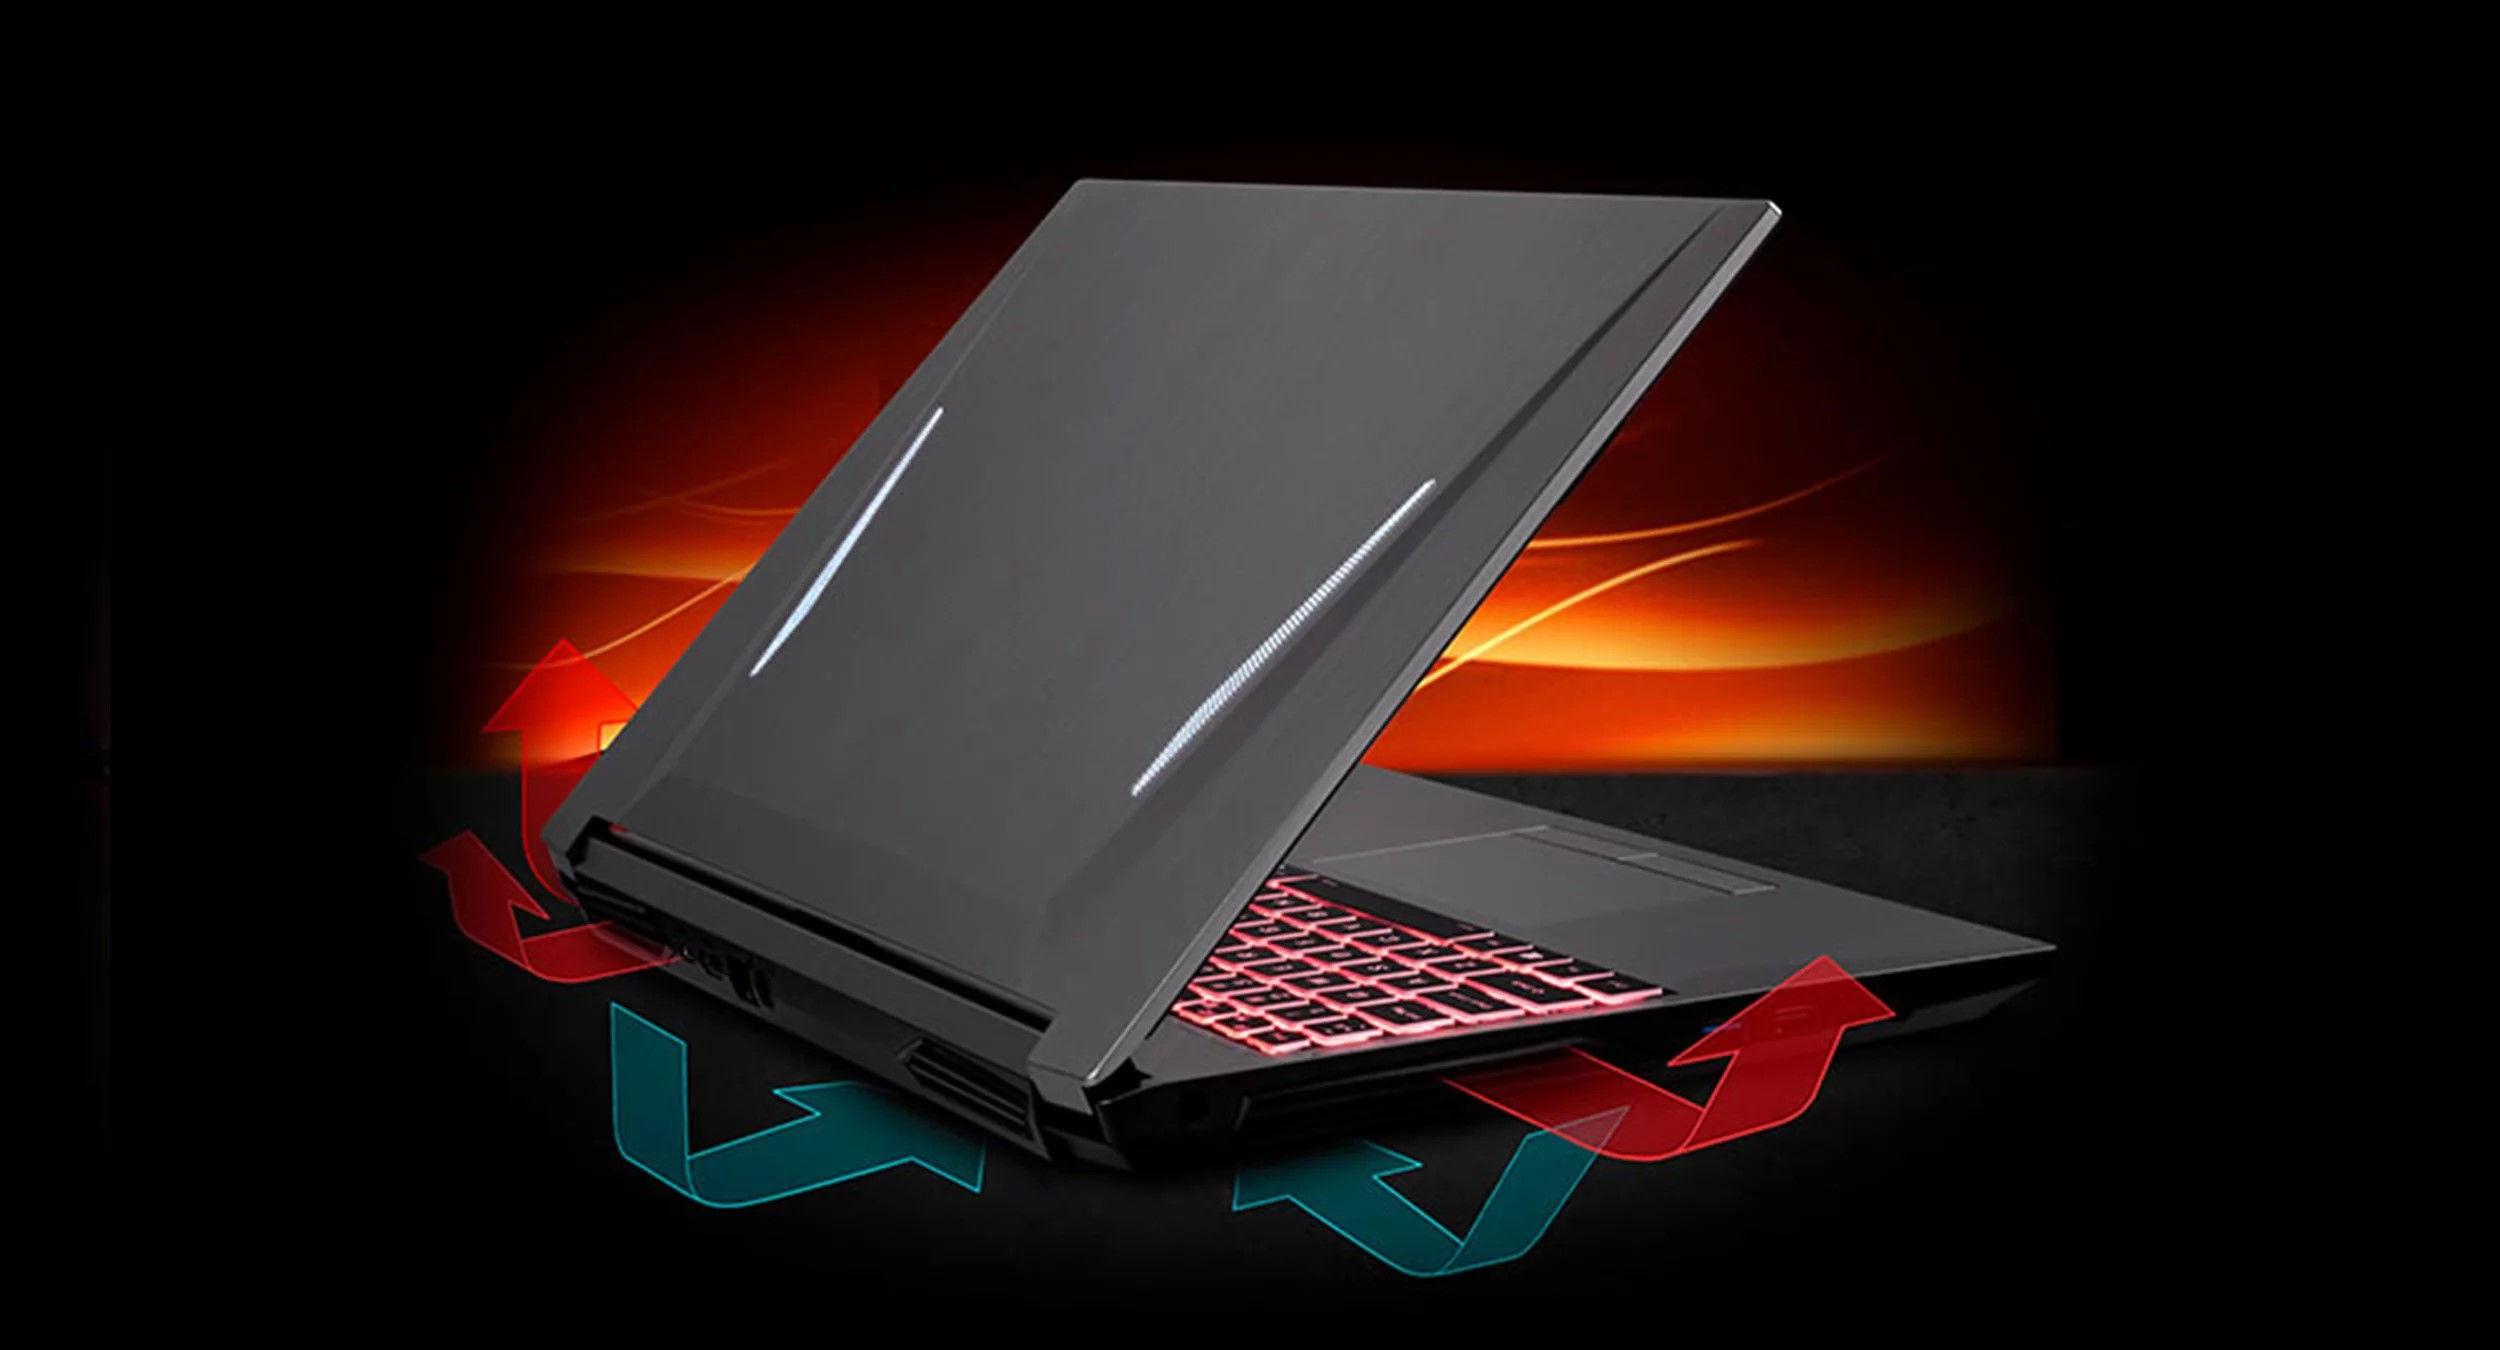 CLEVO-Computer-NH58EDQ-NVIDIA-RTX-2060-Intel-Core-i7-Gaming-Laptop-Custom-Notebook-6